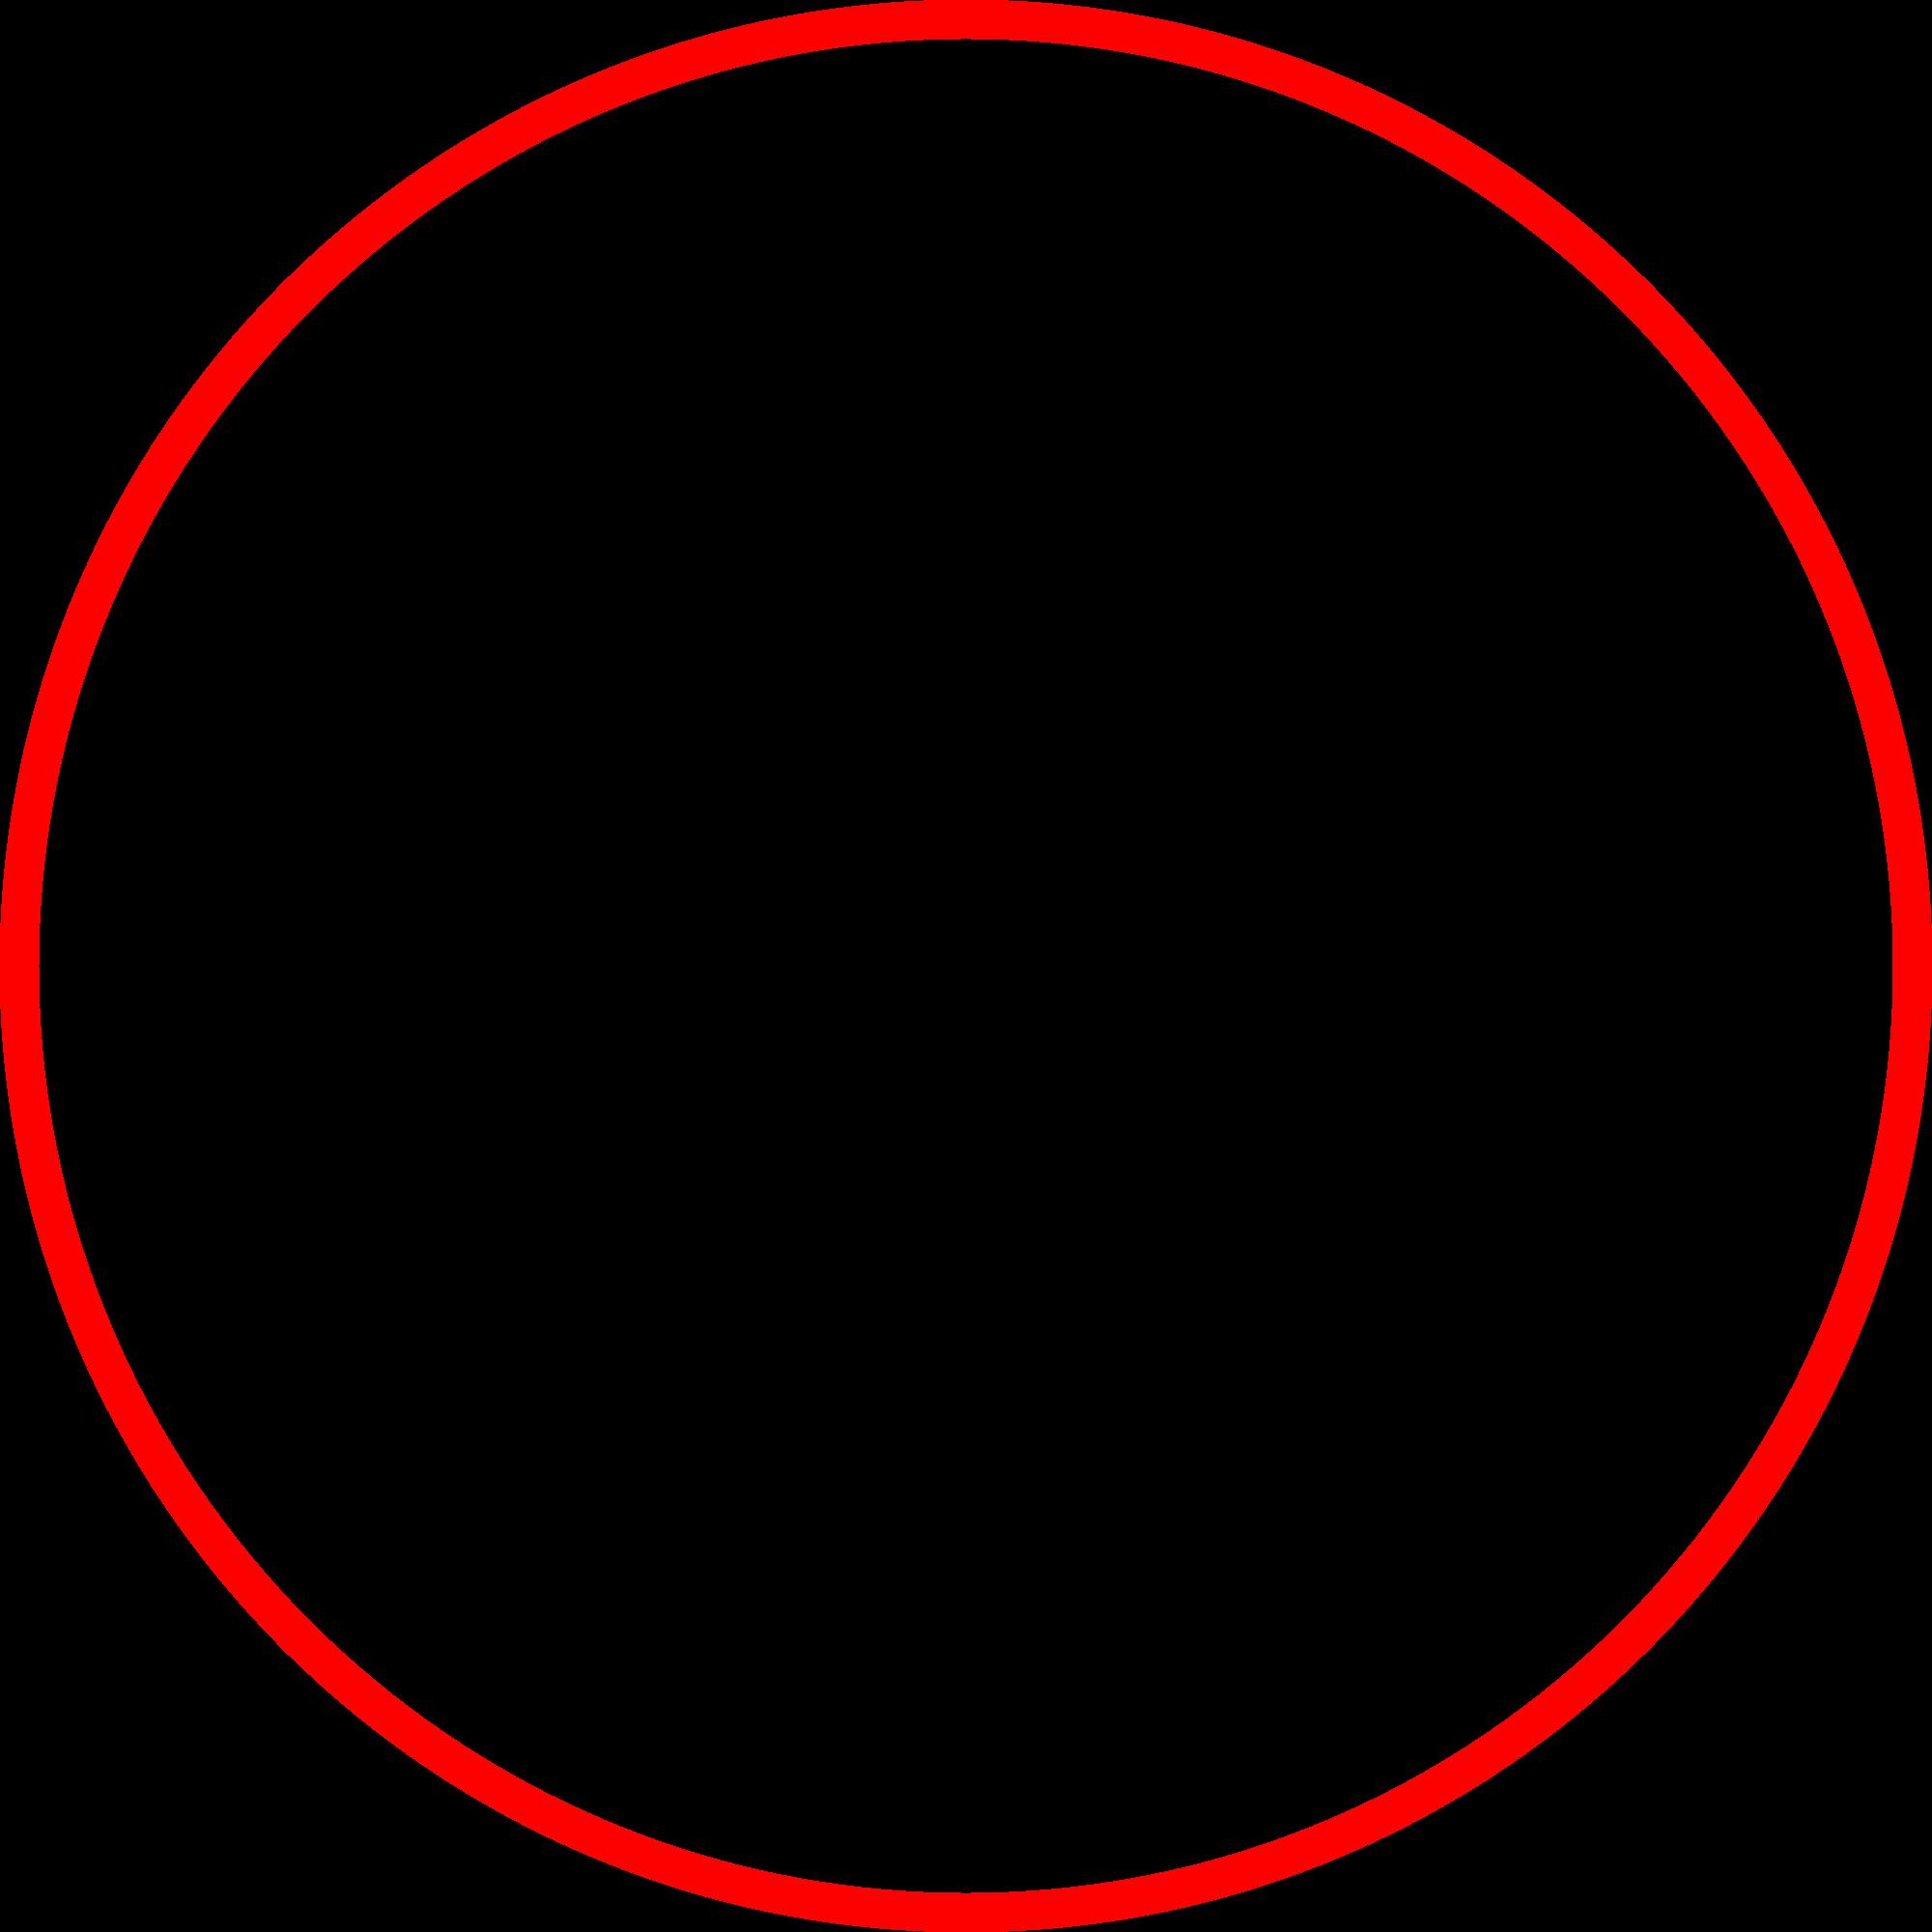 Circle Website Design Template